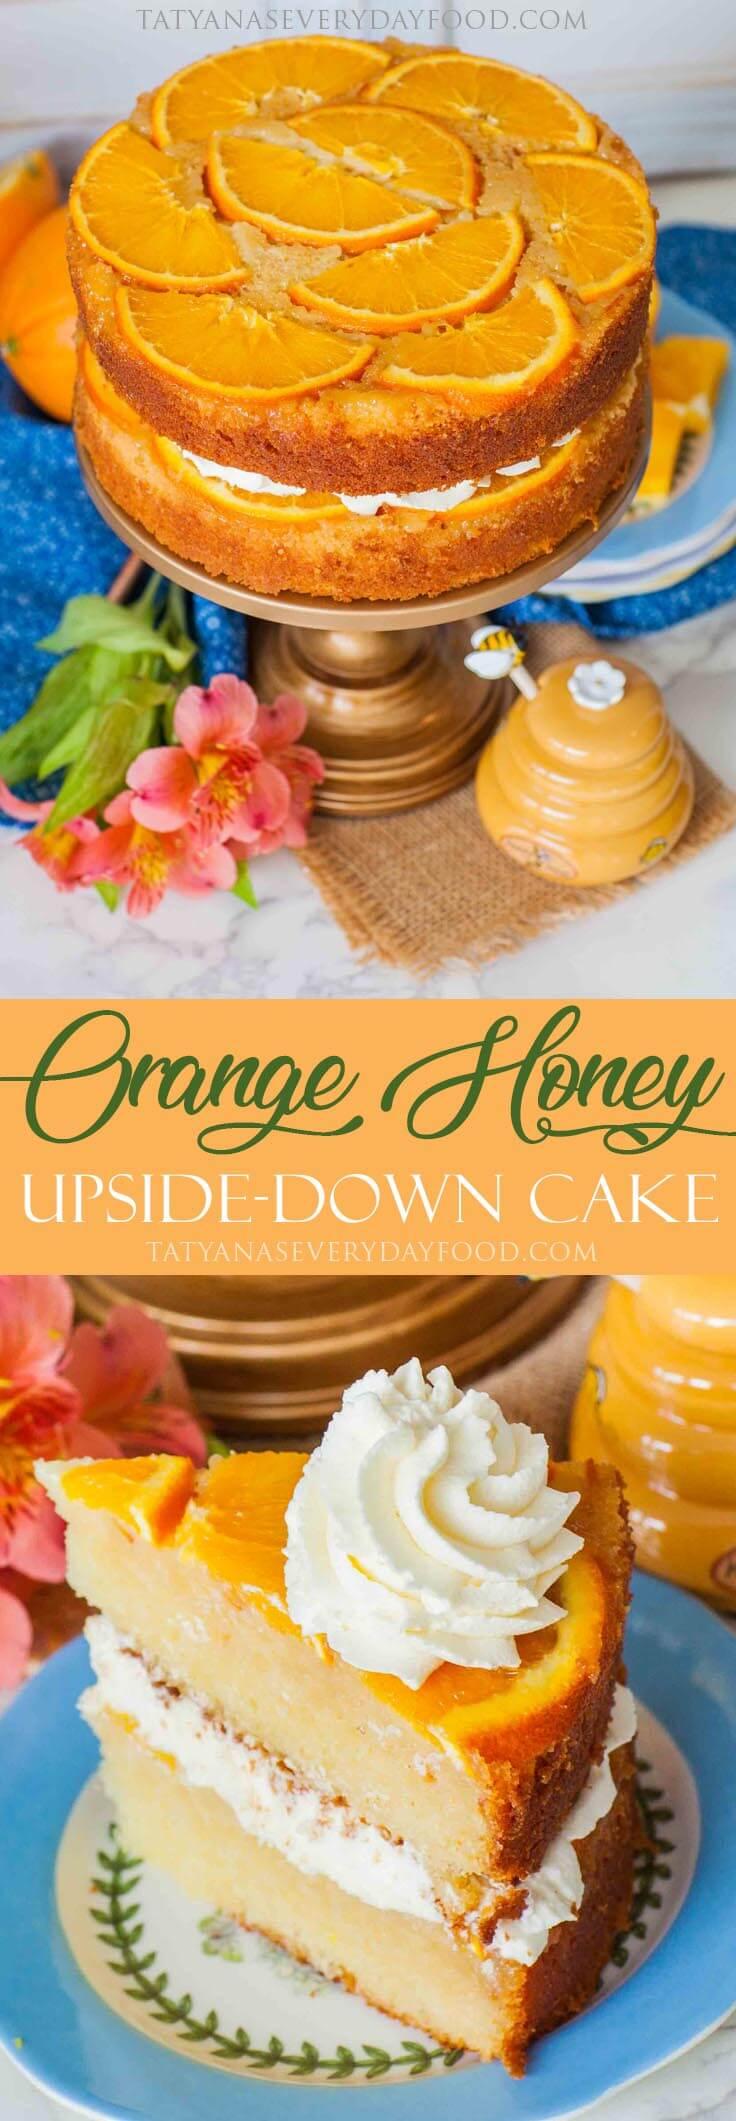 Honey Orange Upside-Down Cake recipe with video